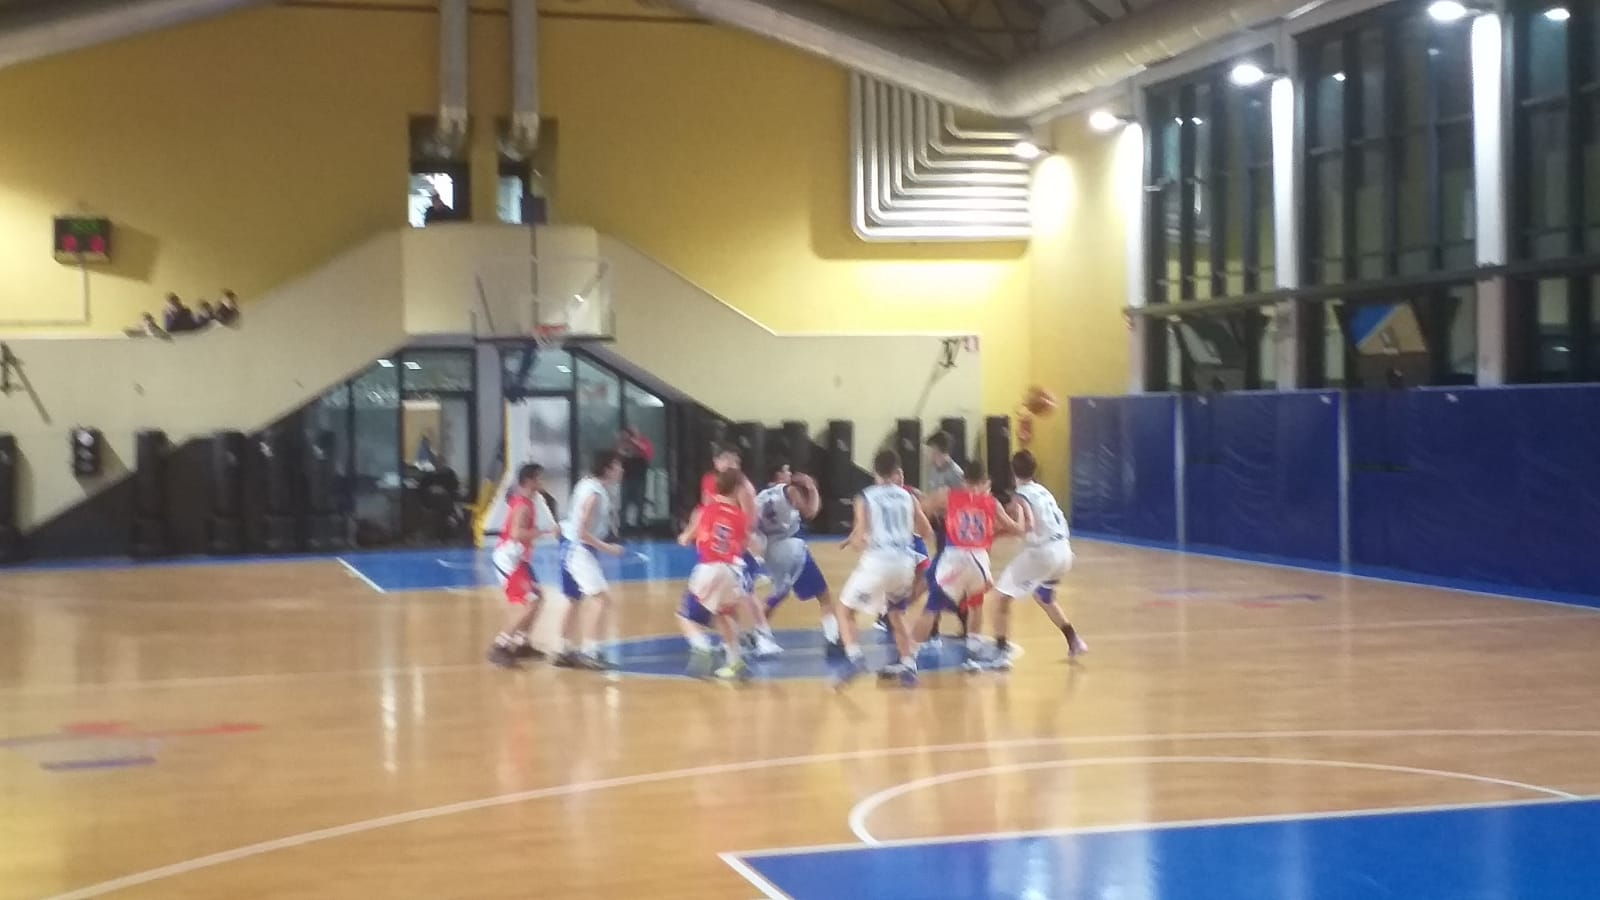 U14e Uisp XVIII - Olimpia Roma 41-93 4